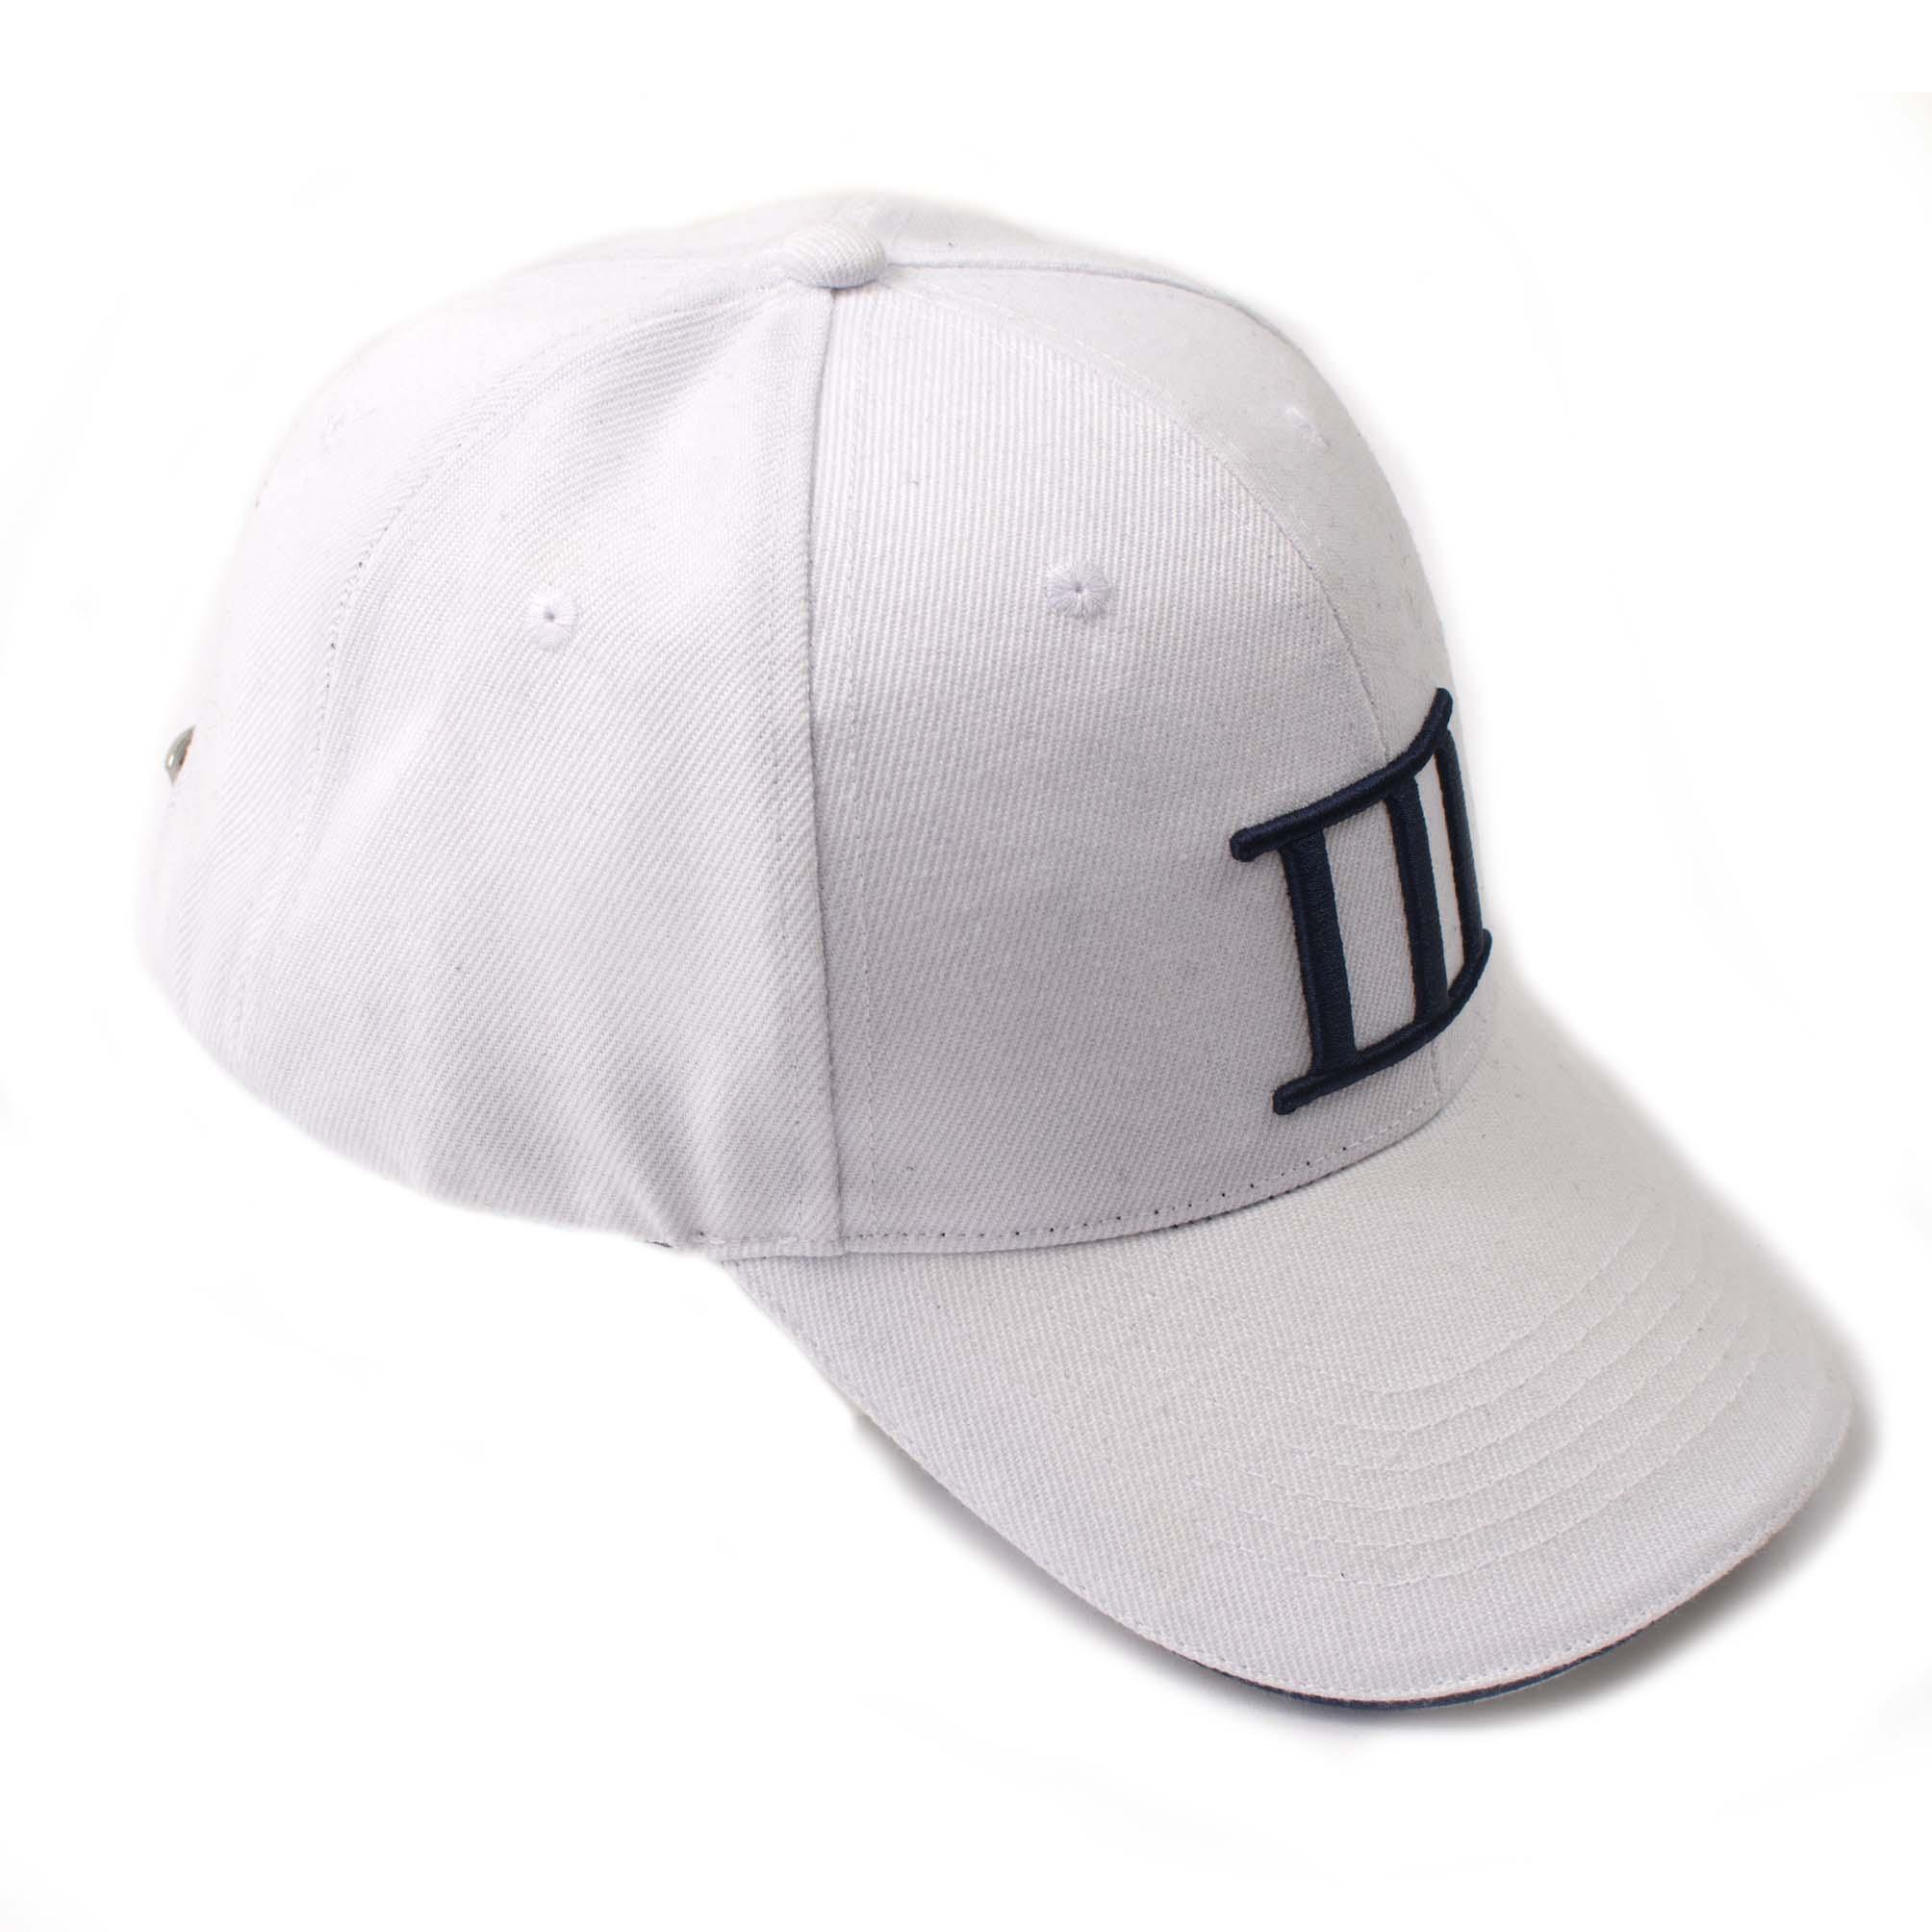 White Tresanti branded cap